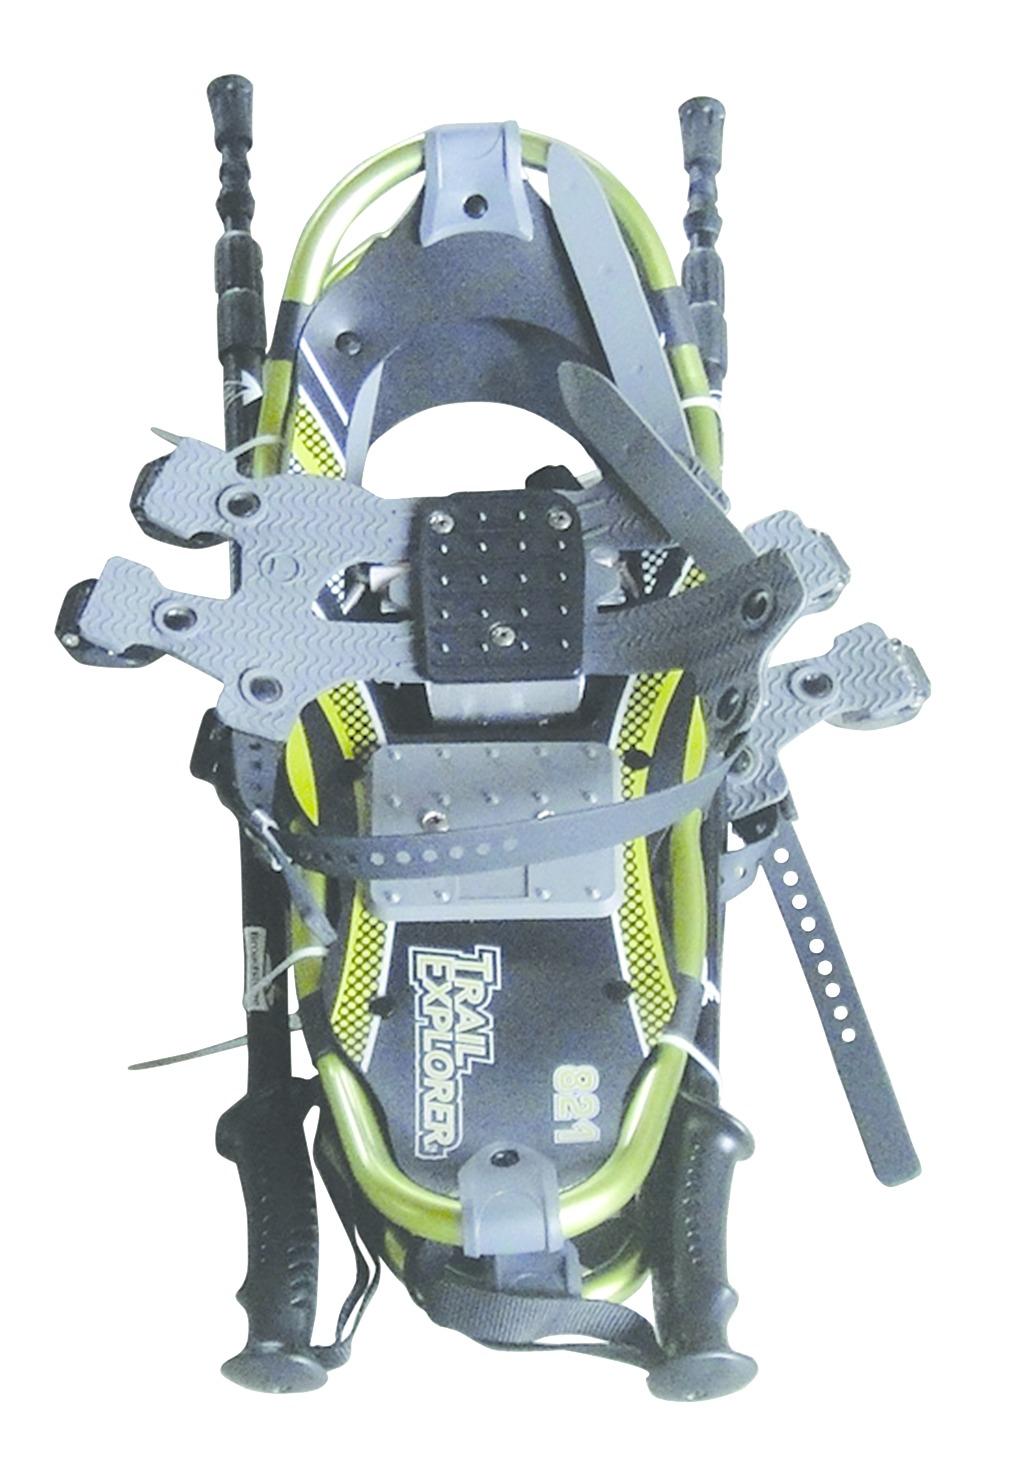 Expedition SSKIT-36 Trail Kit 10